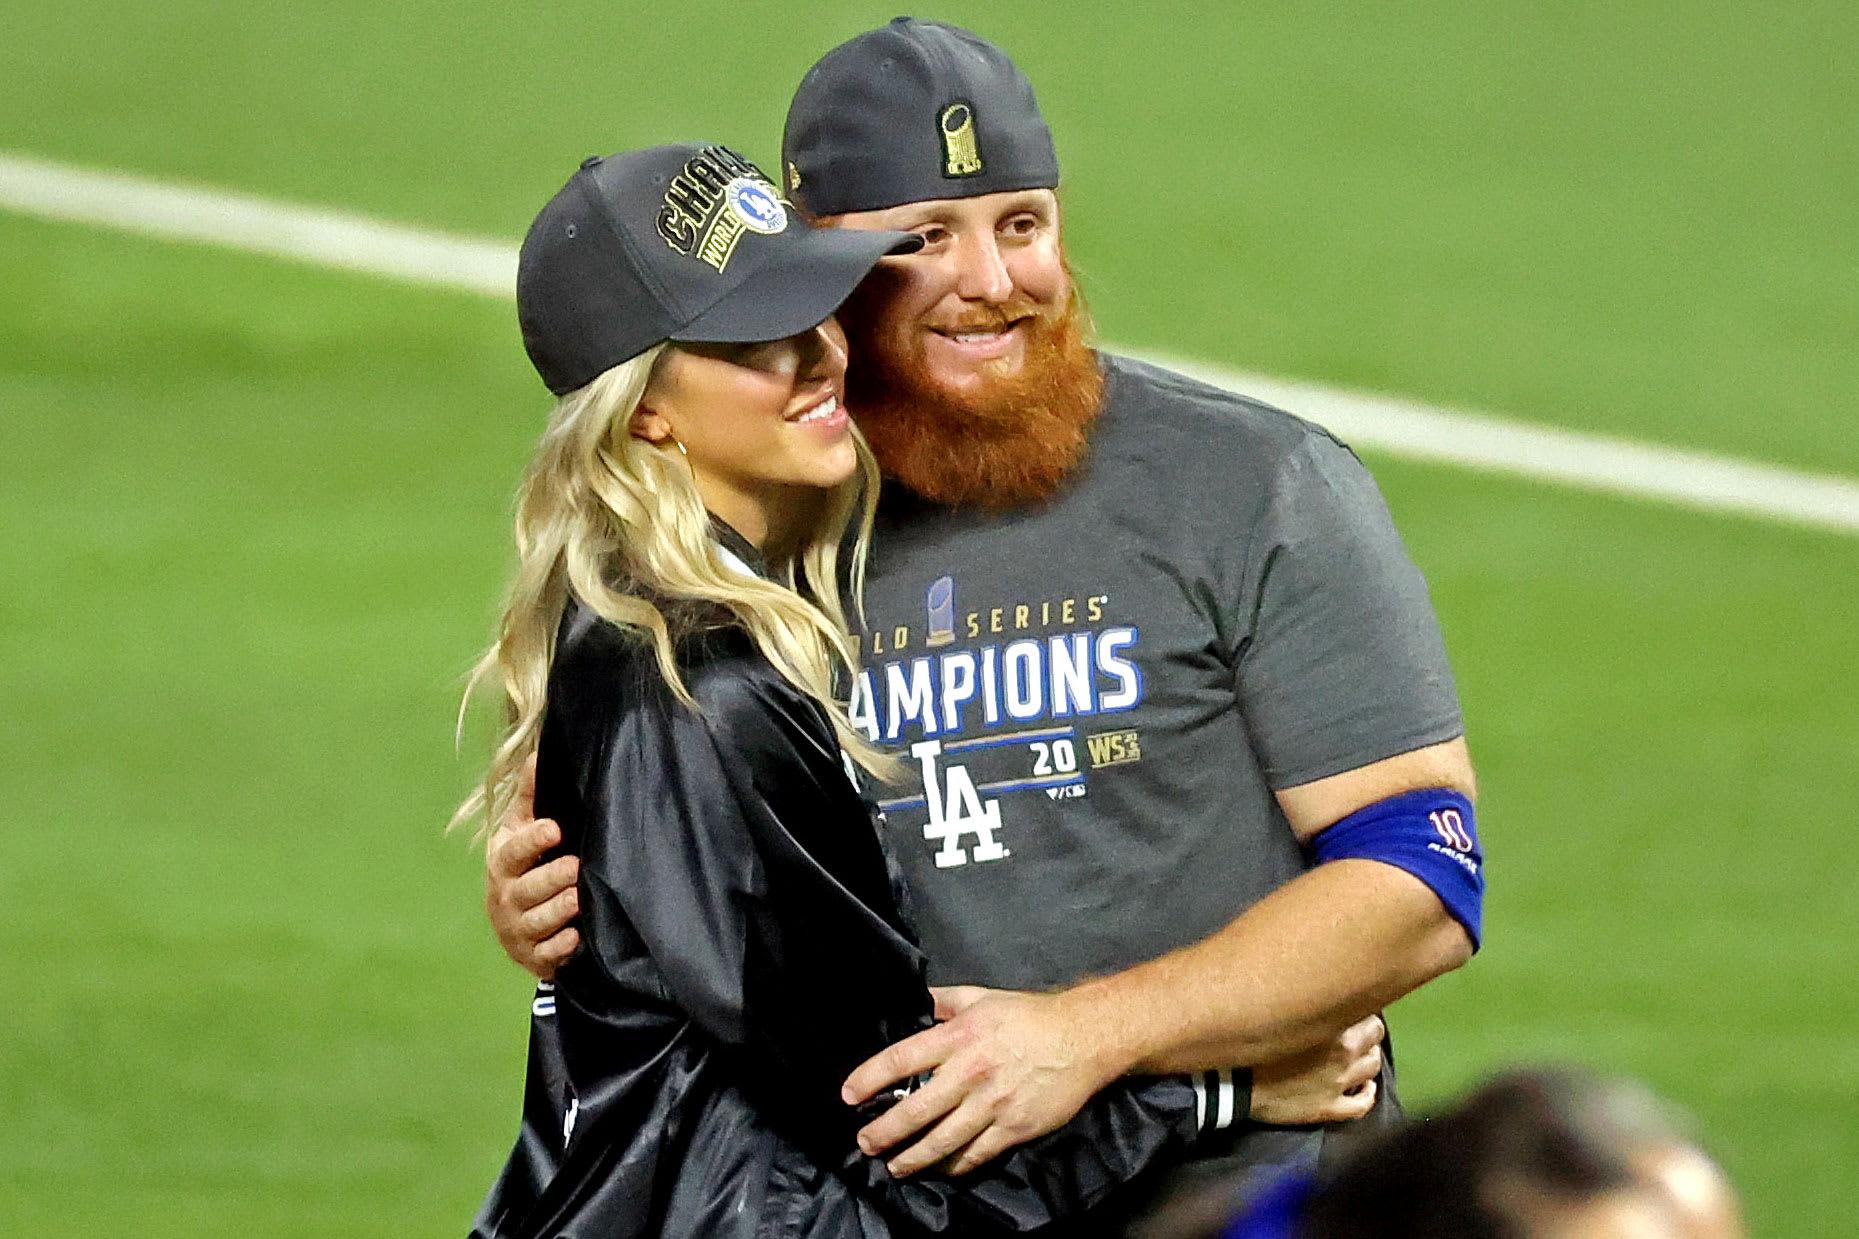 Dodgers' Justin Turner avoids self-discipline after breaking MLB Covid-19 protocol